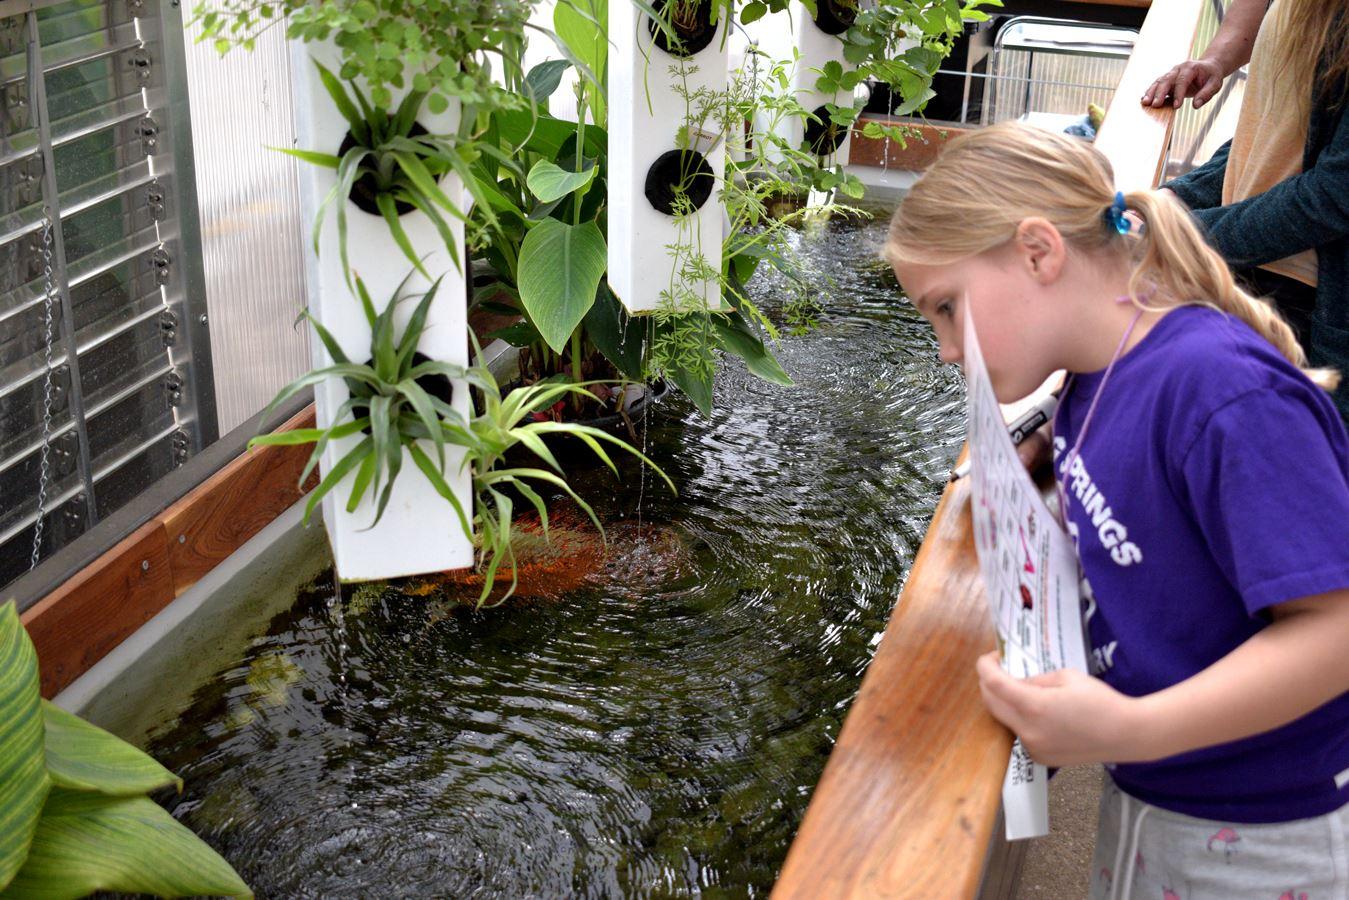 A child examining an aquaponics garden.